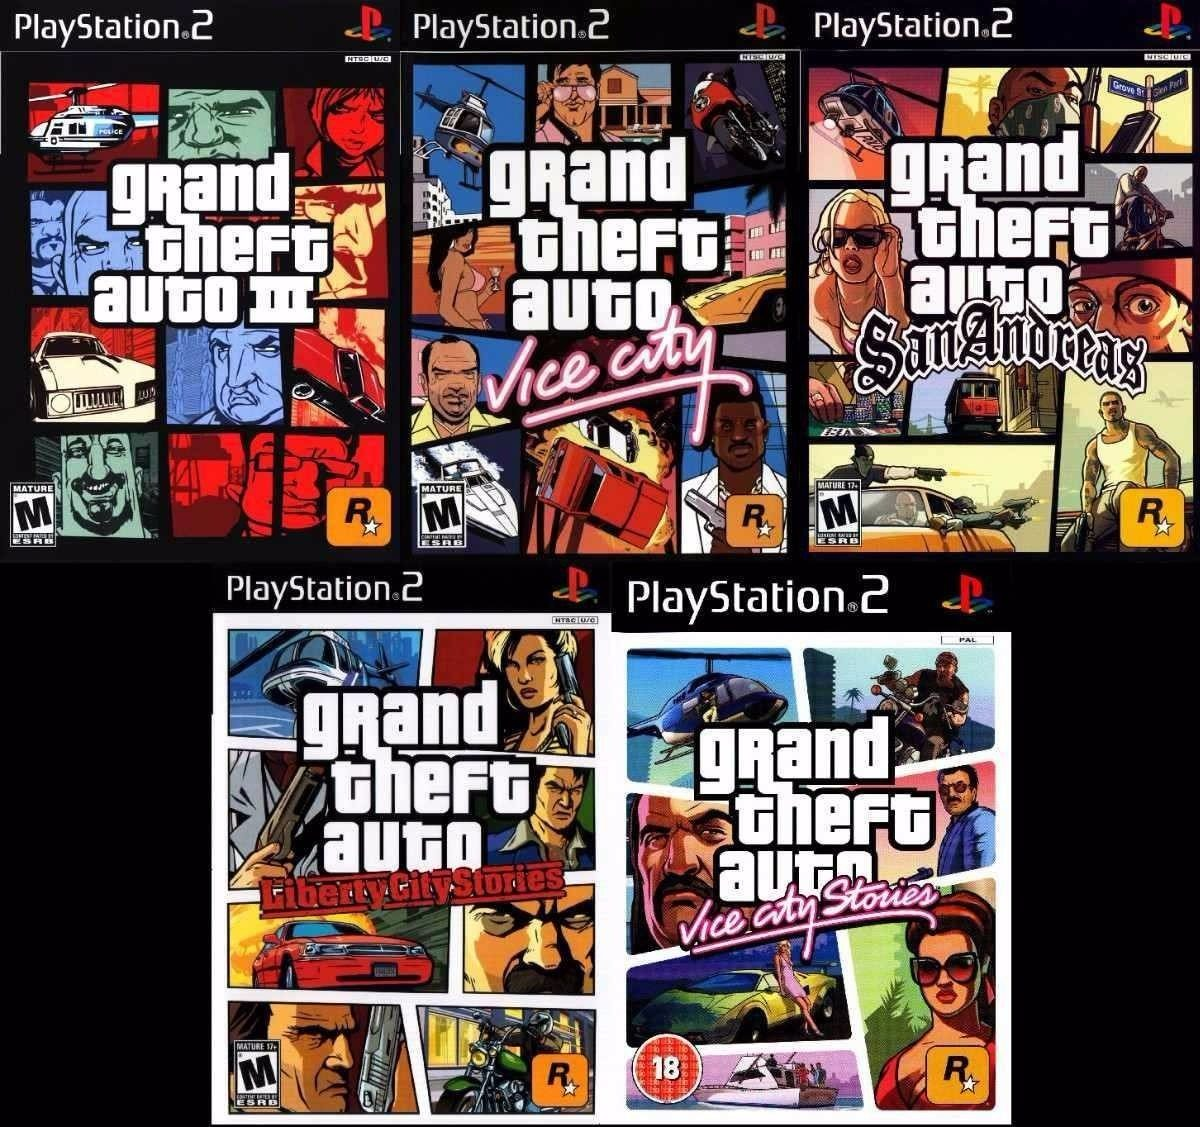 Ps2 Saga Grand Theft Auto Gta 5 Juegos Para Play 2 170 00 En